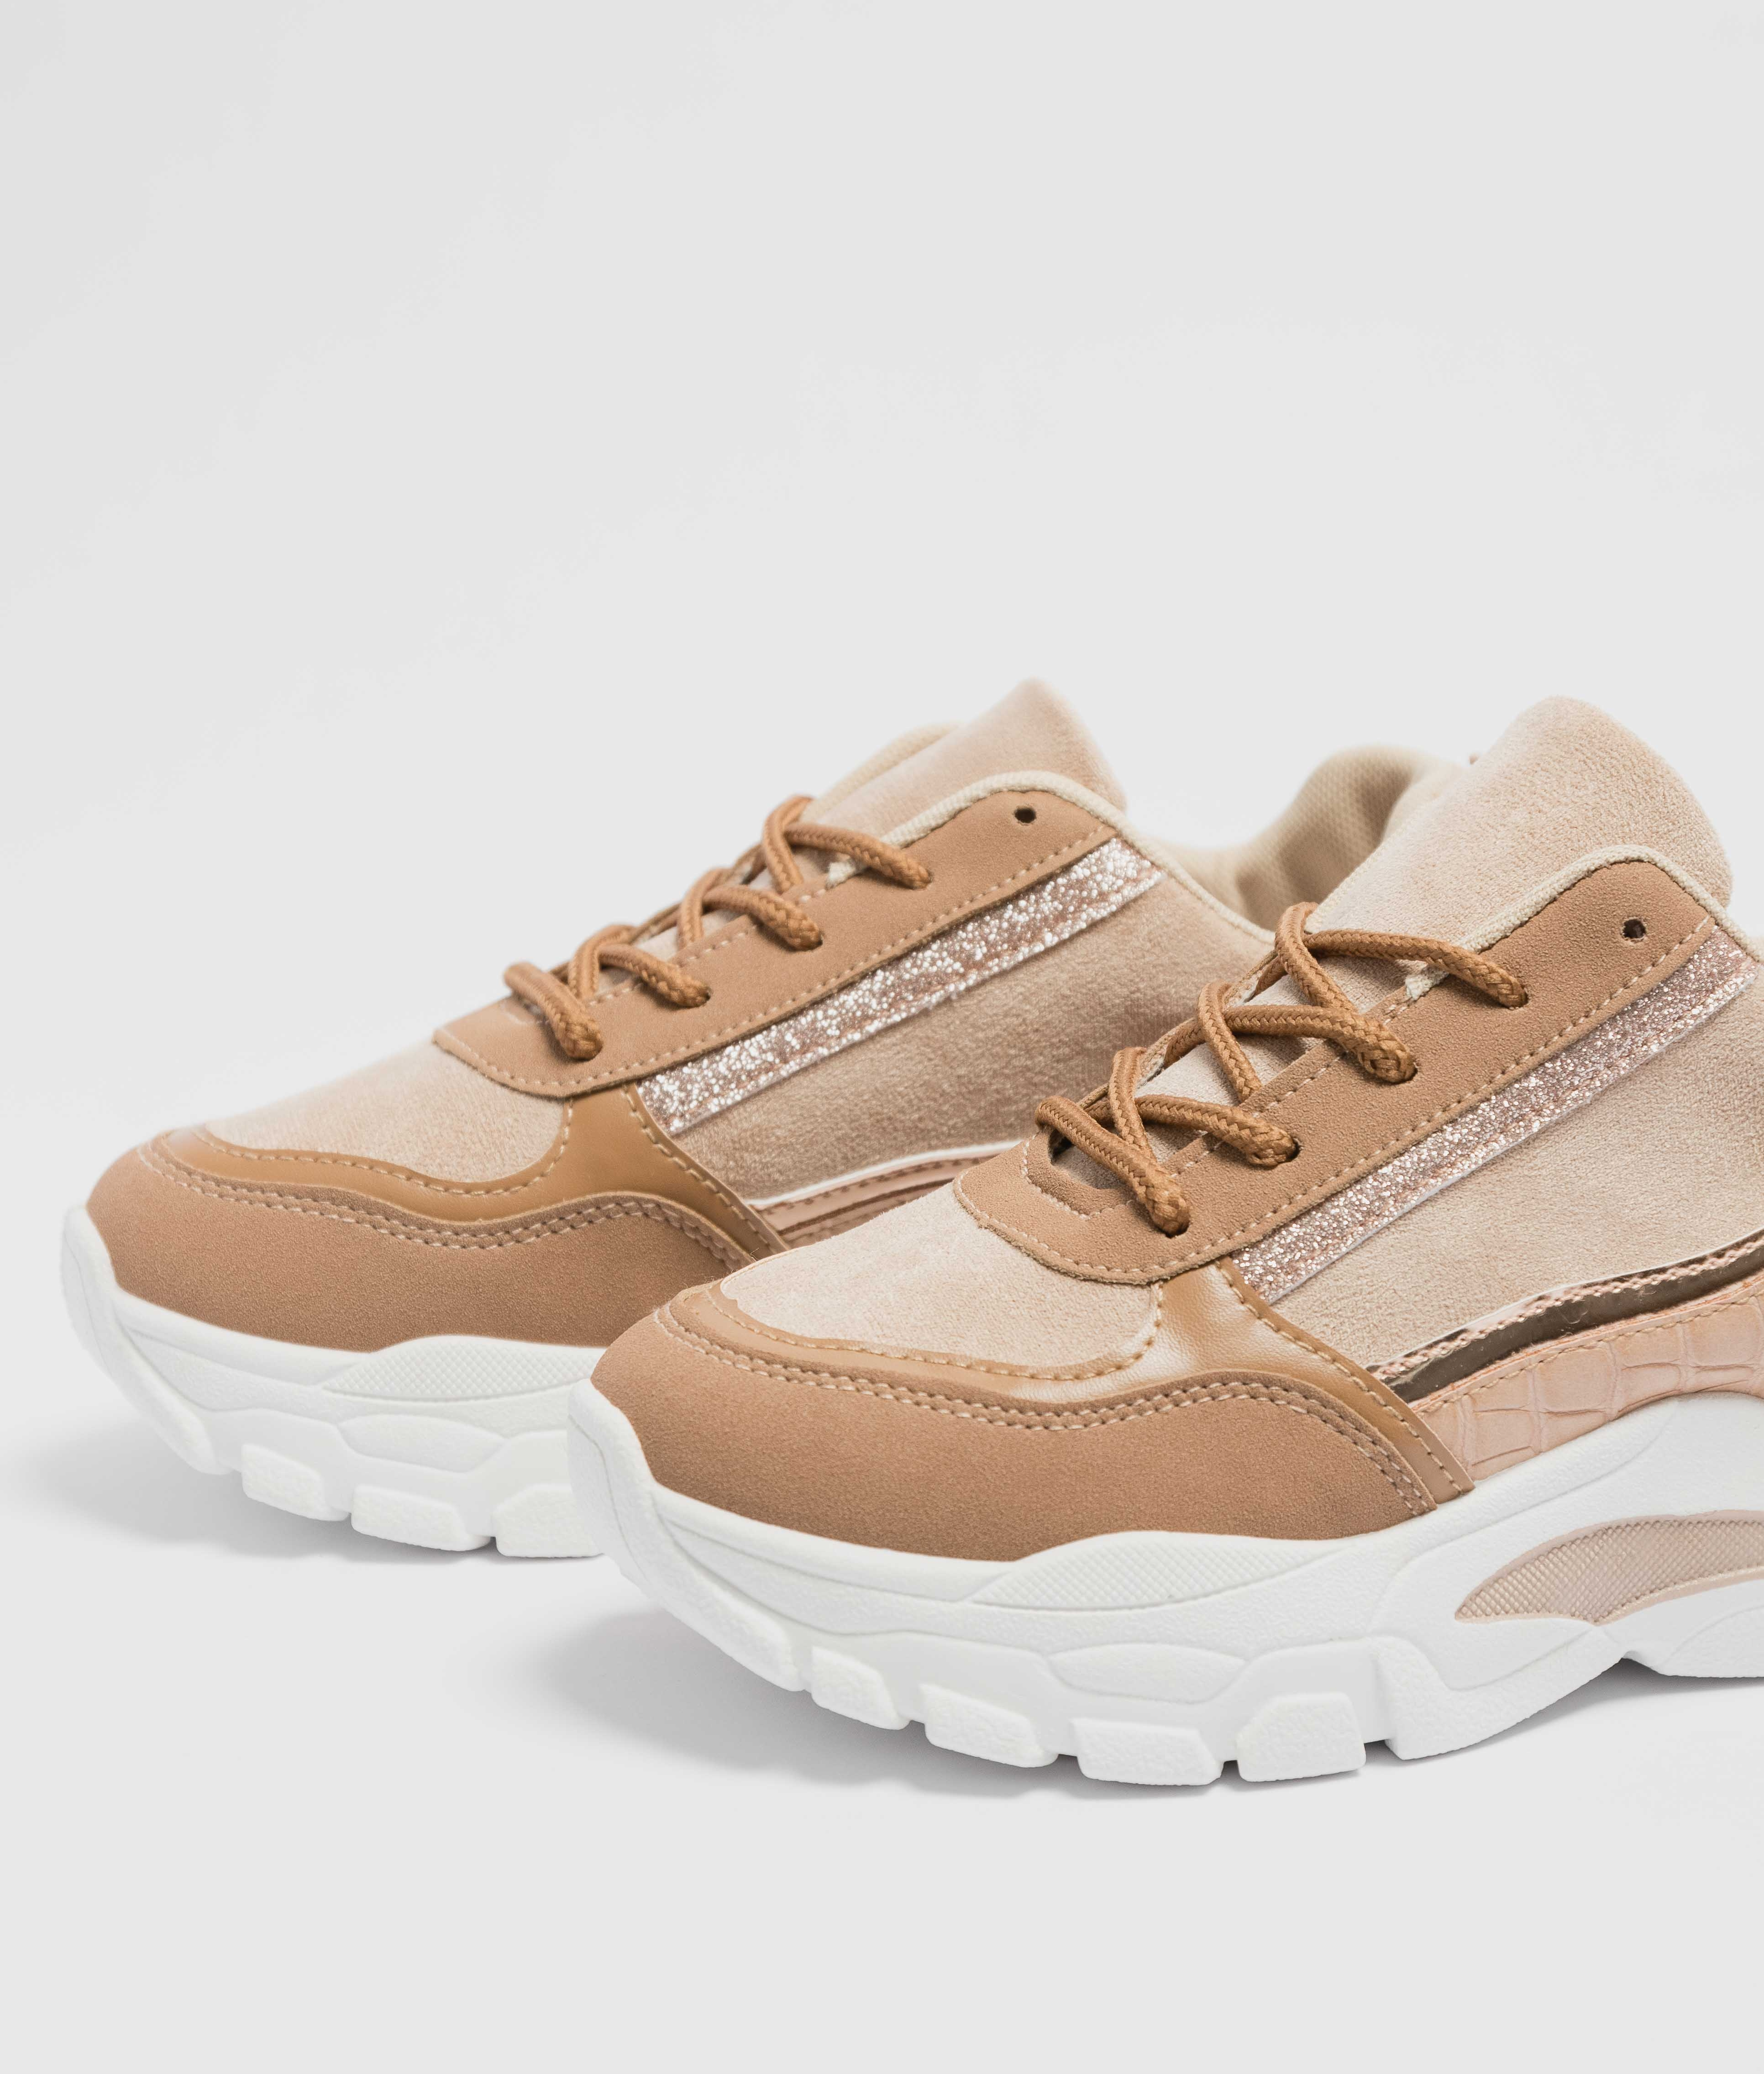 Sneakers Roney - Kaki